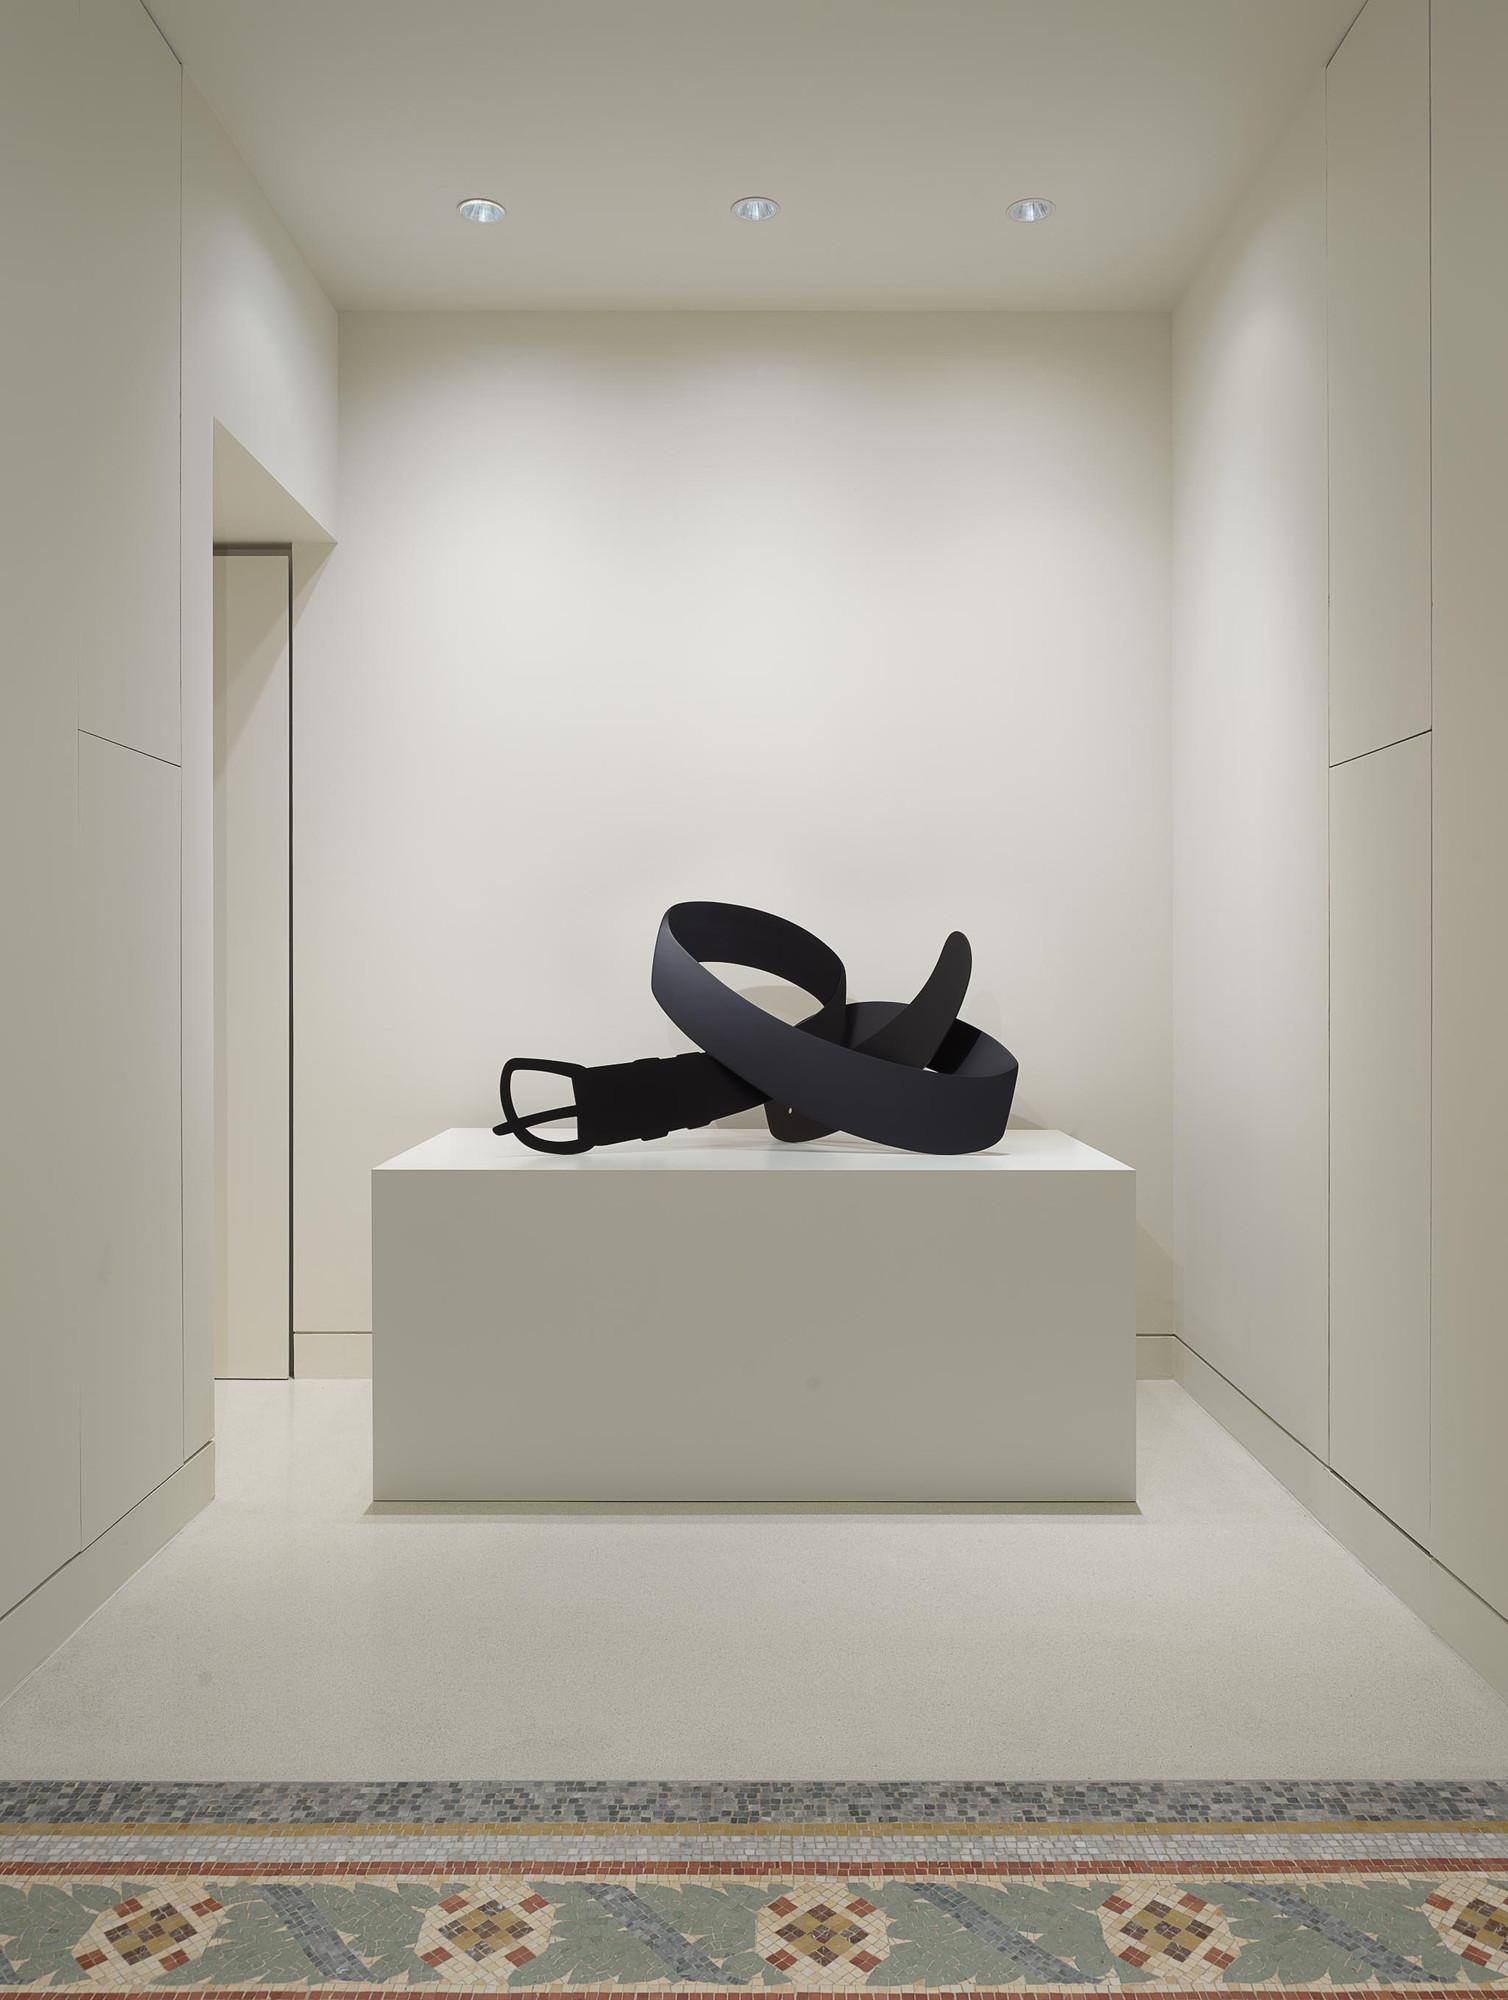 Tom-Wesselman-at-Nouveau-Musee-National-de-Monaco-31.jpg